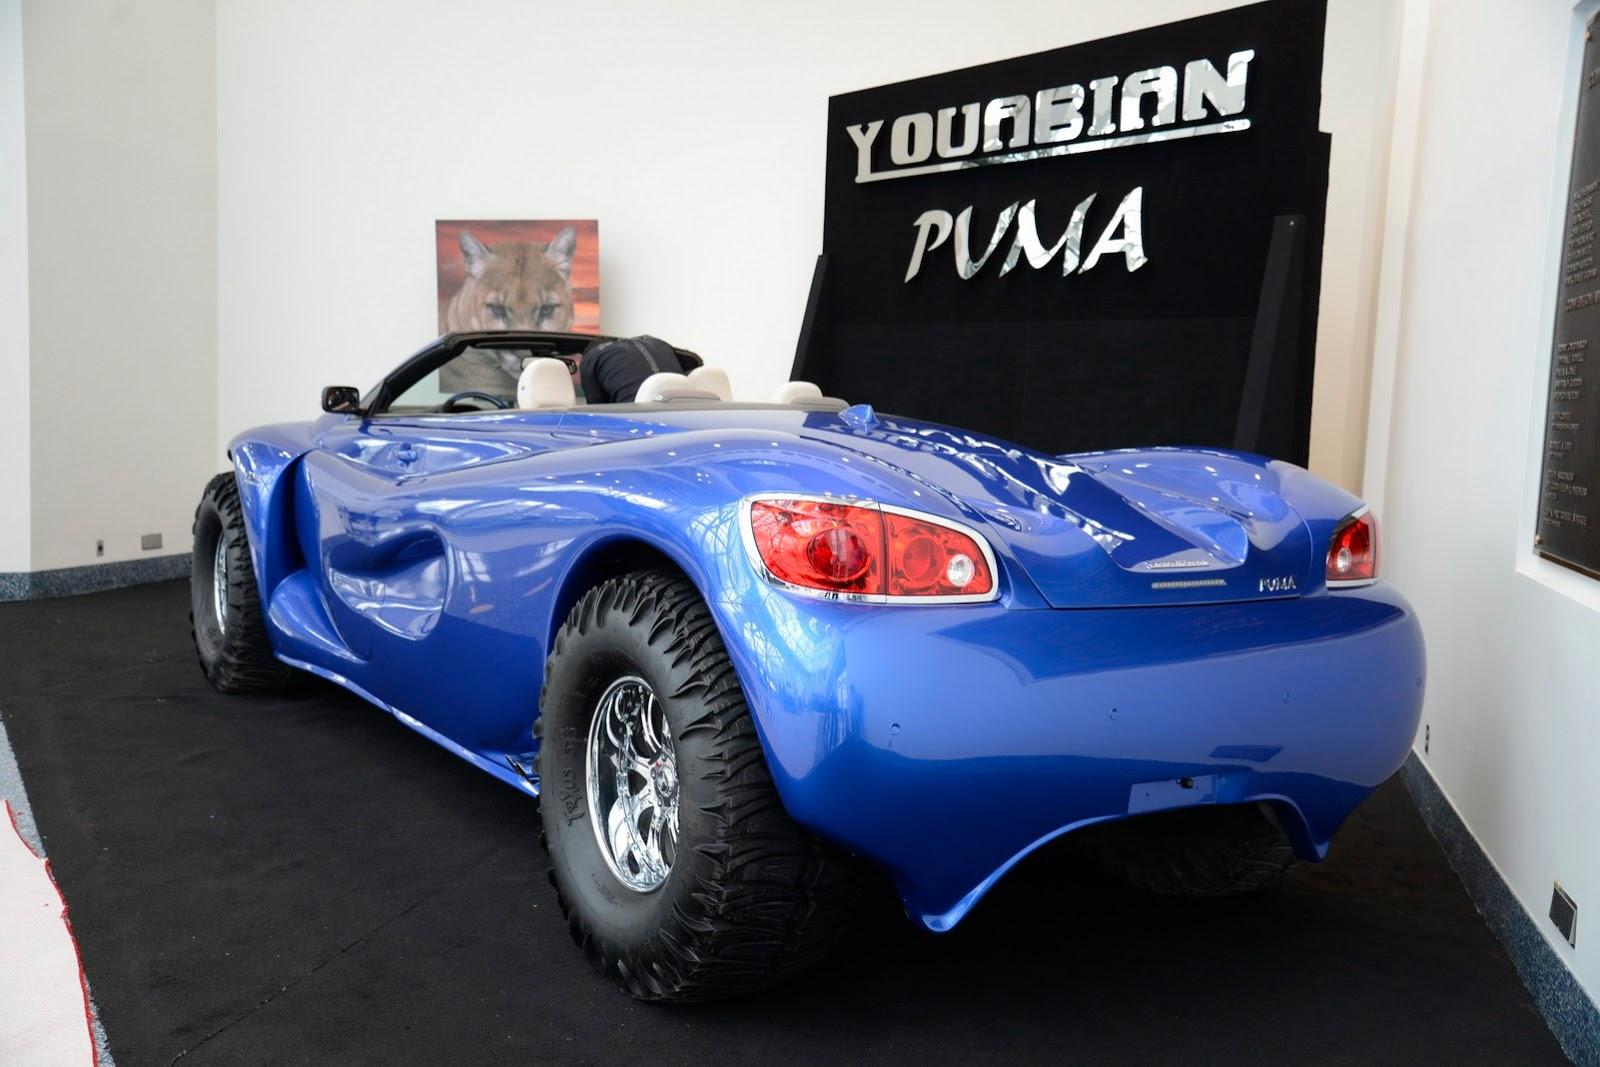 Youabian-Puma-4%25255B2%25255D.jpg